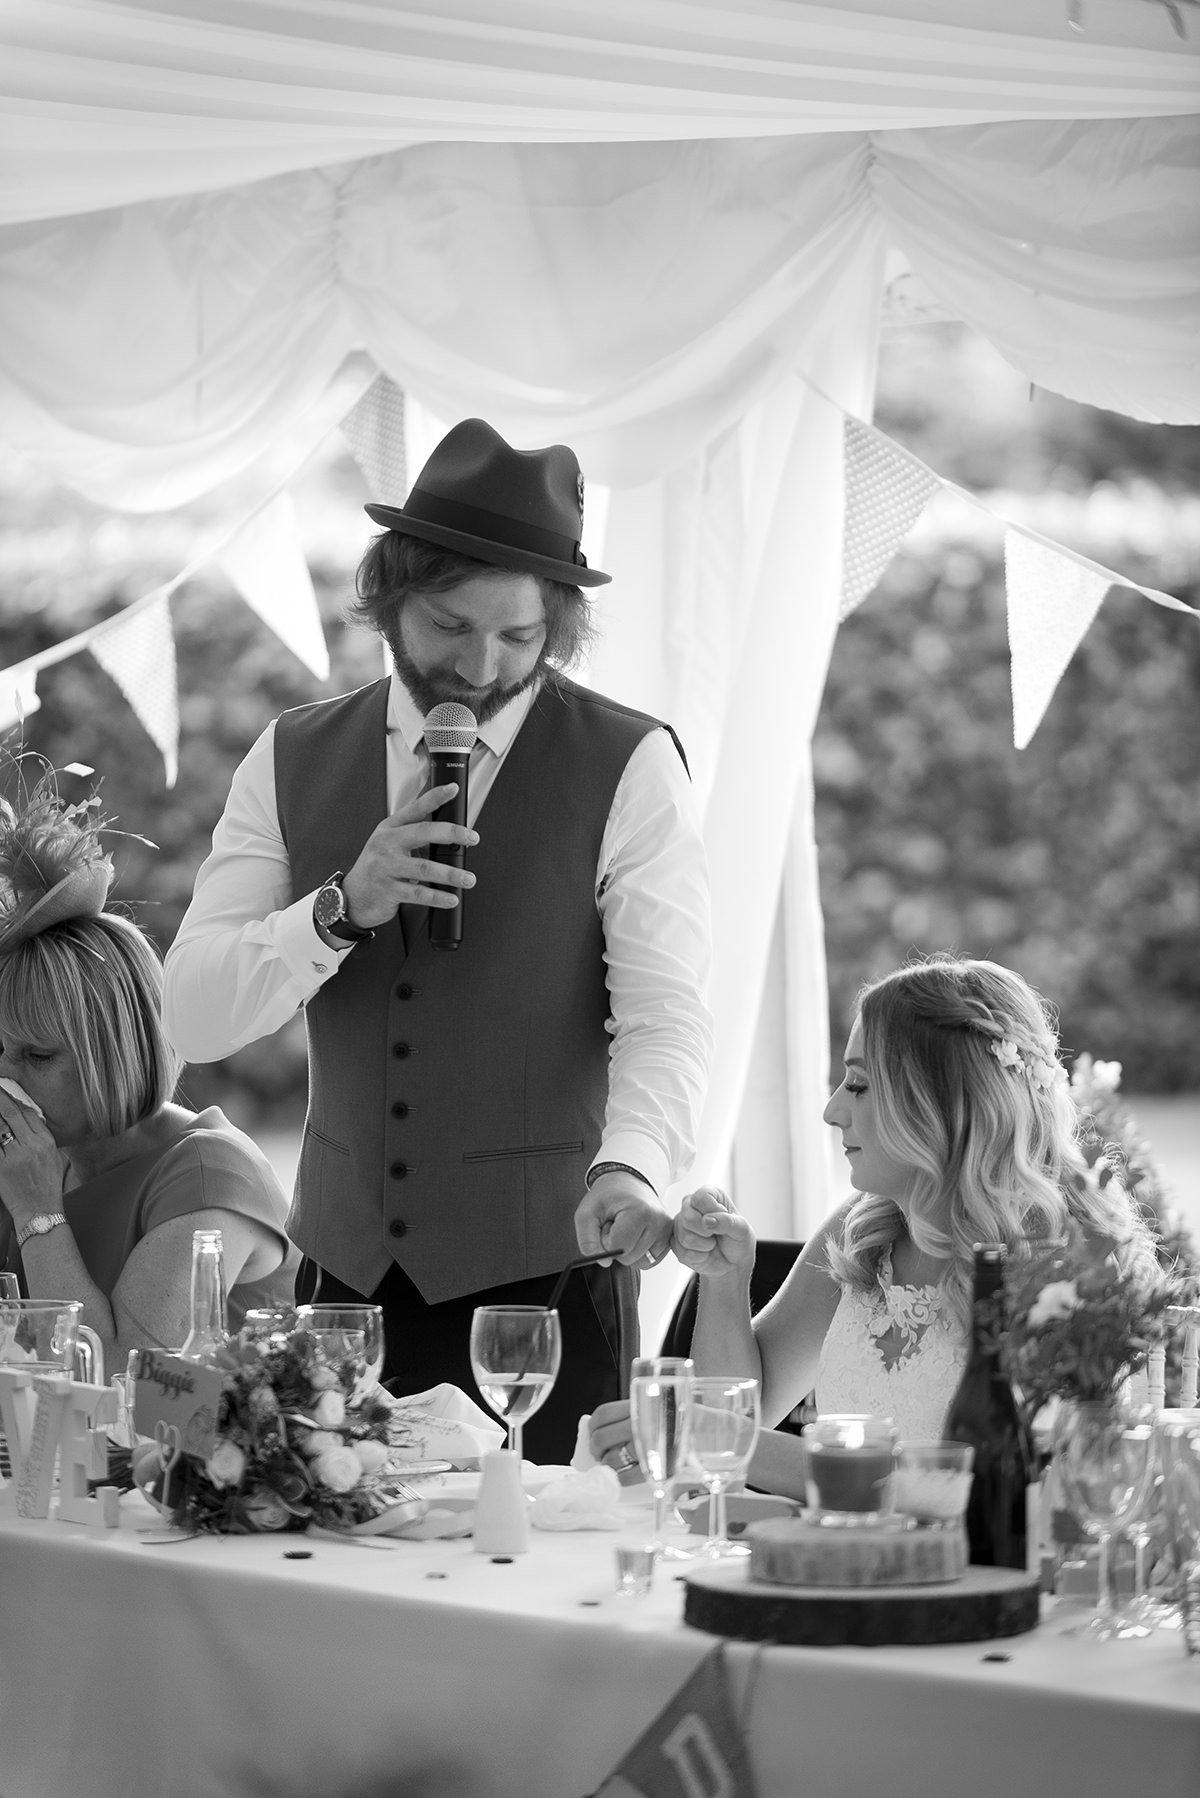 Bride and groom fist pump